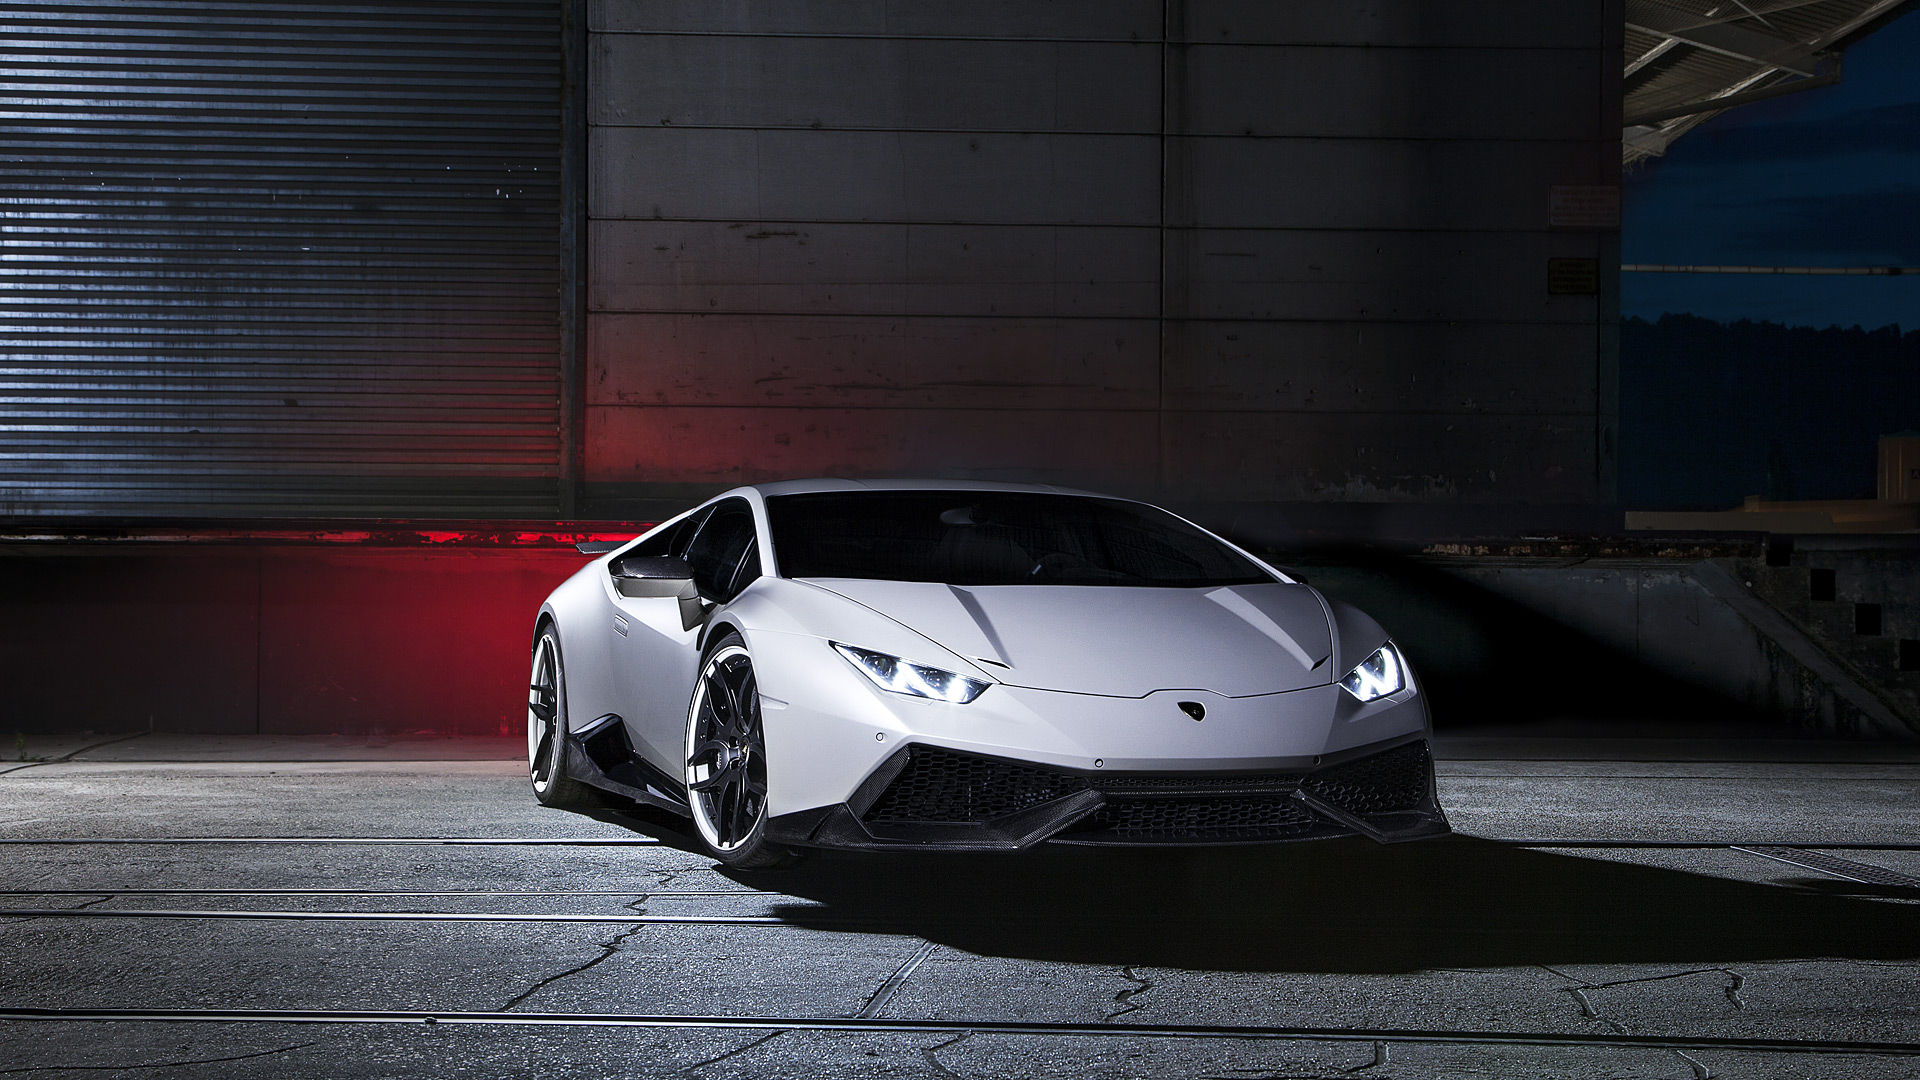 2015 Novitec Torado Lamborghini Huracan